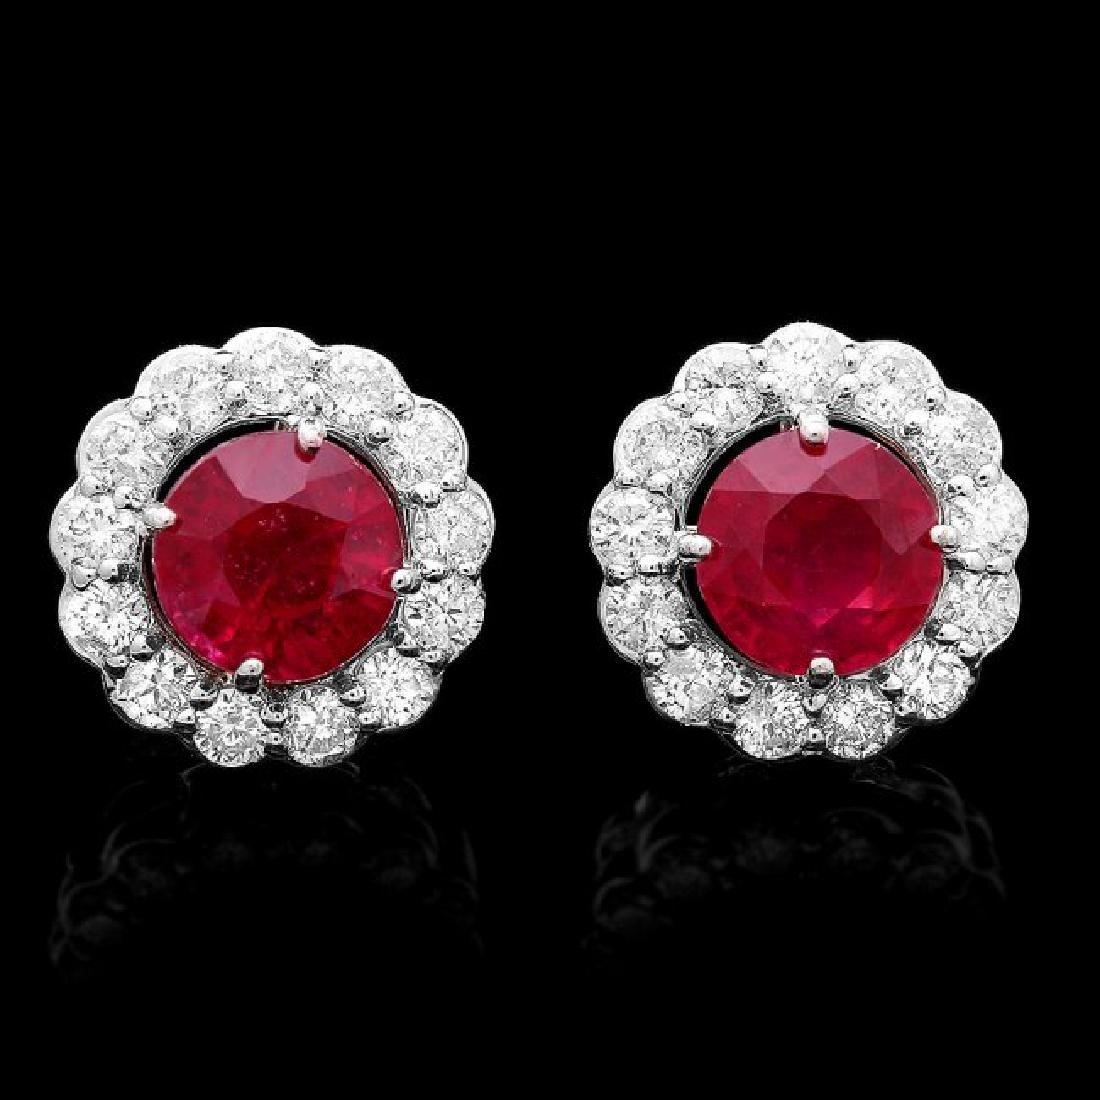 14k Gold 3.80ct Ruby 1.20ct Diamond Earrings